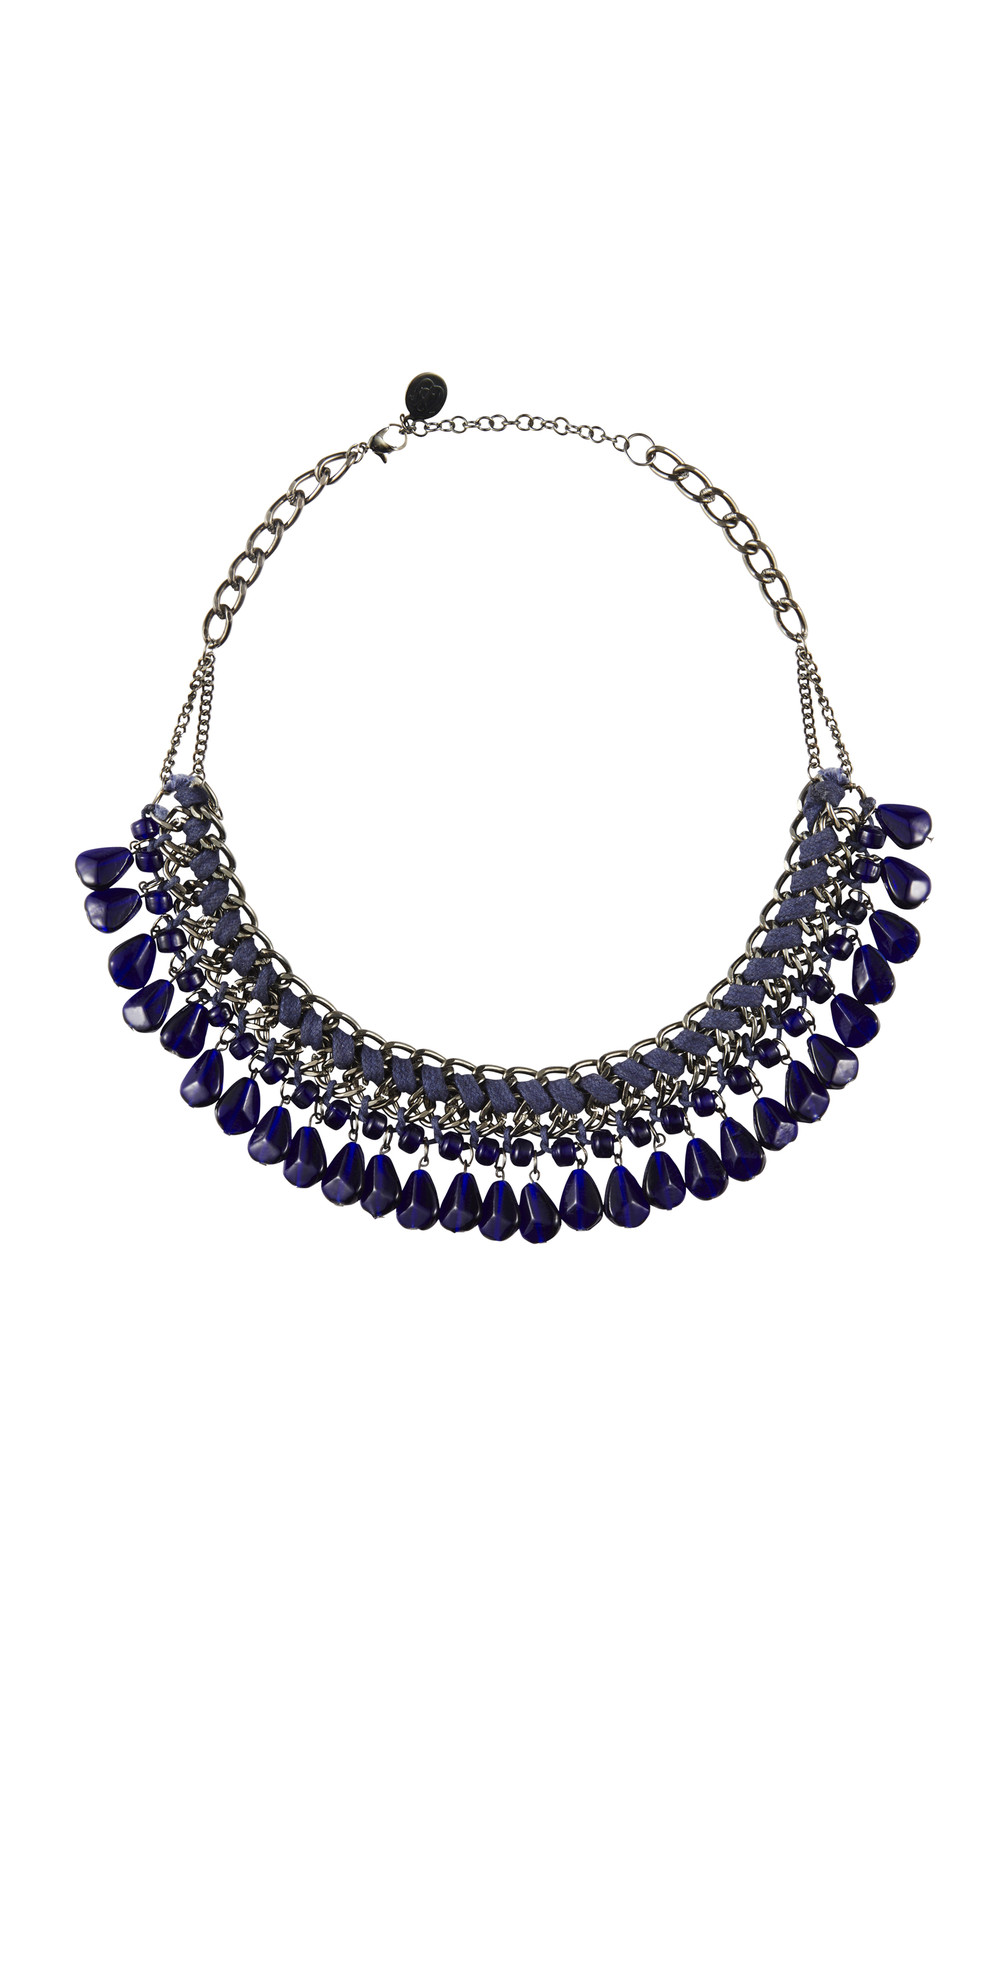 sandwich clothing braided bead necklace in nightfall